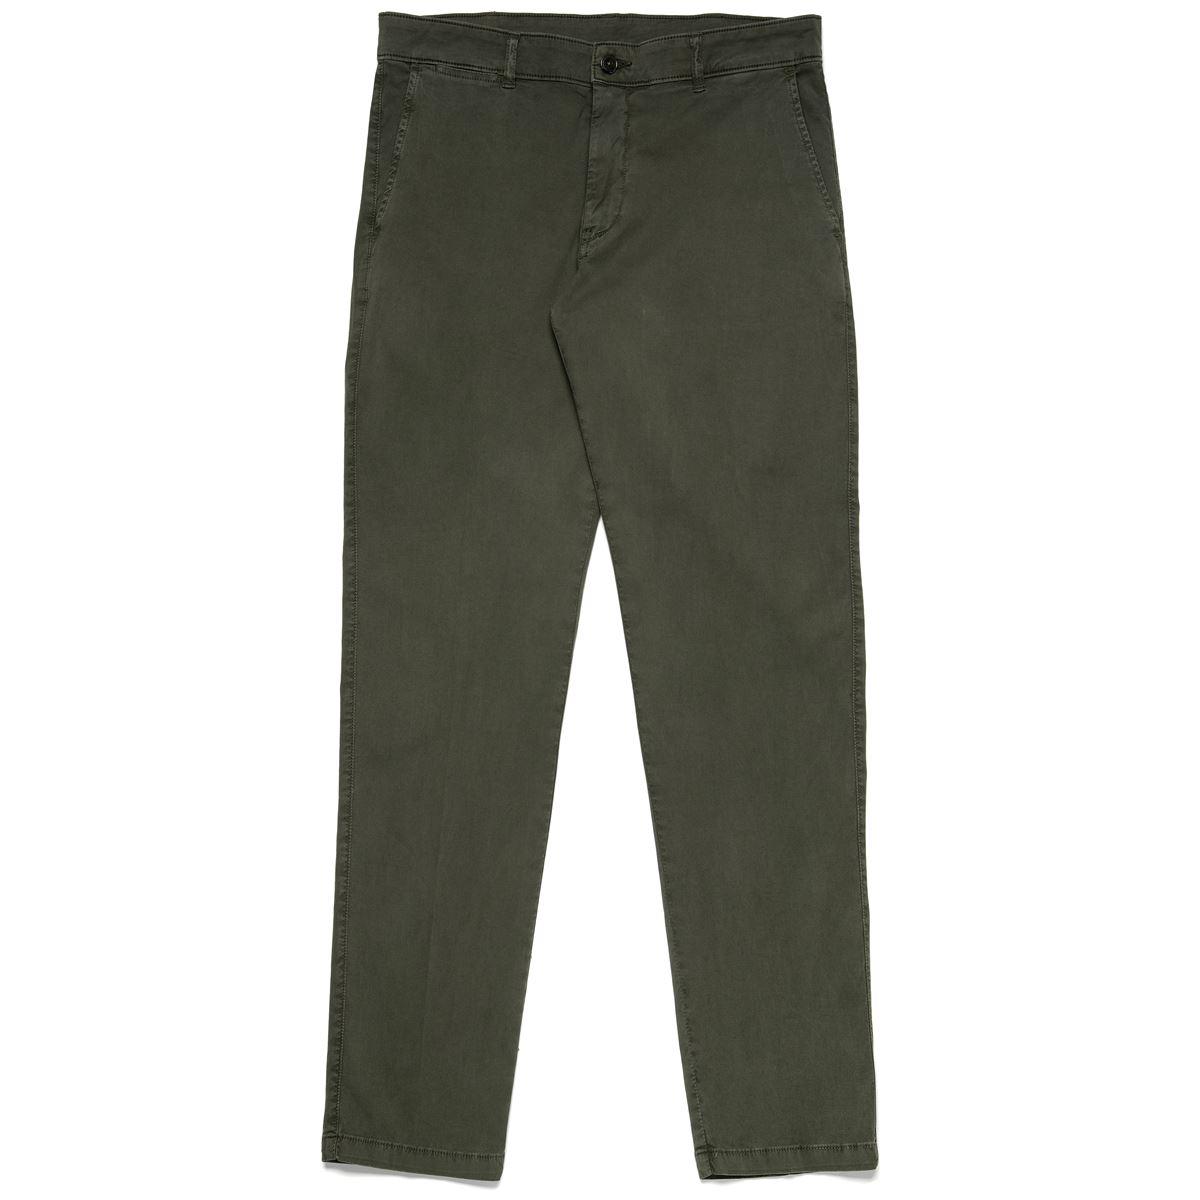 Robe di Kappa Pantaloni uomo-62118HW